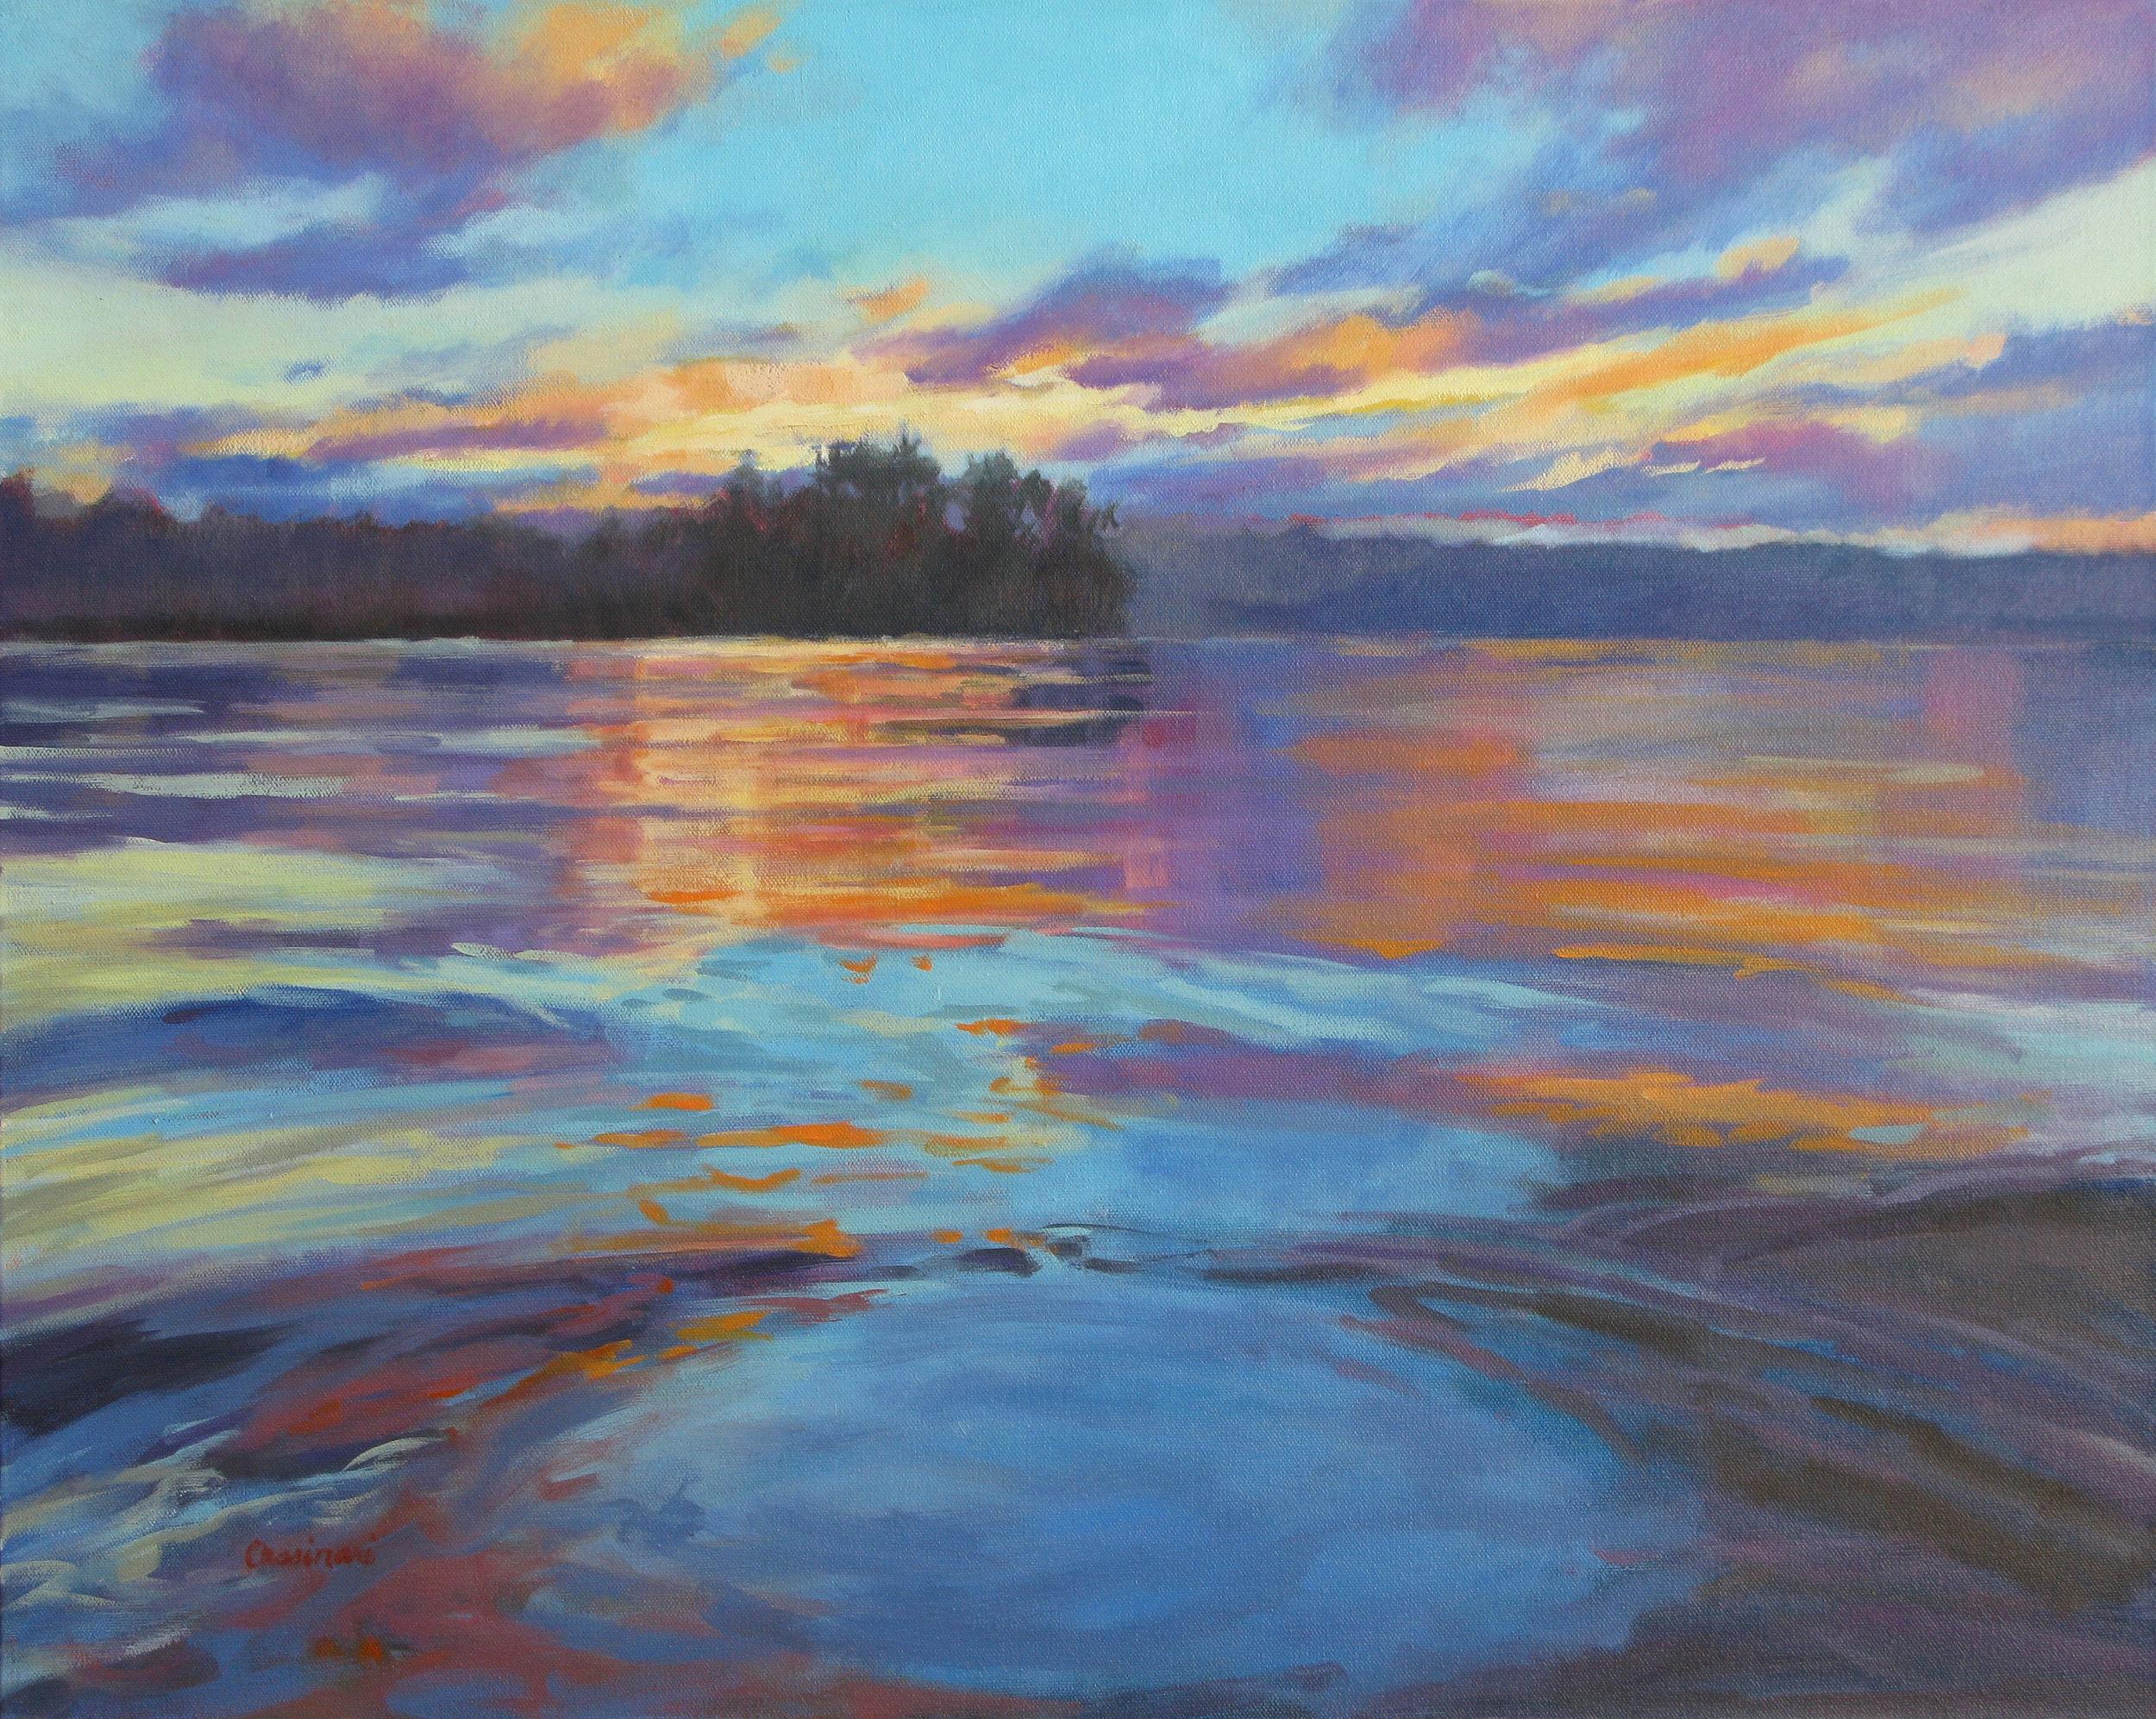 Cassinari_Lake At Twilight_24x30_$1200.jpg